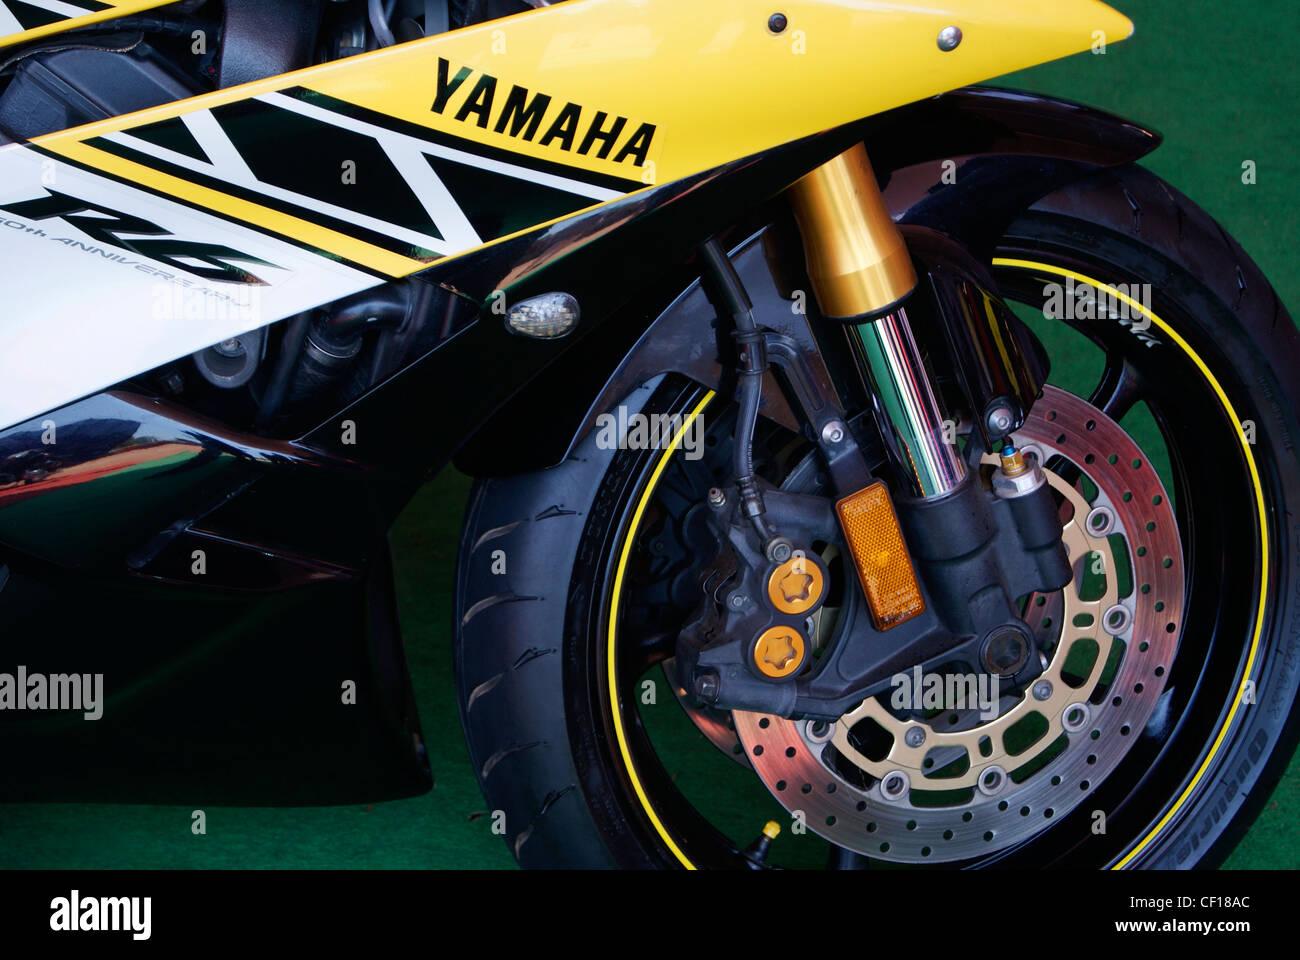 Closeup Front Side View Of Stylish Yamaha R6 Racing Bike Stock